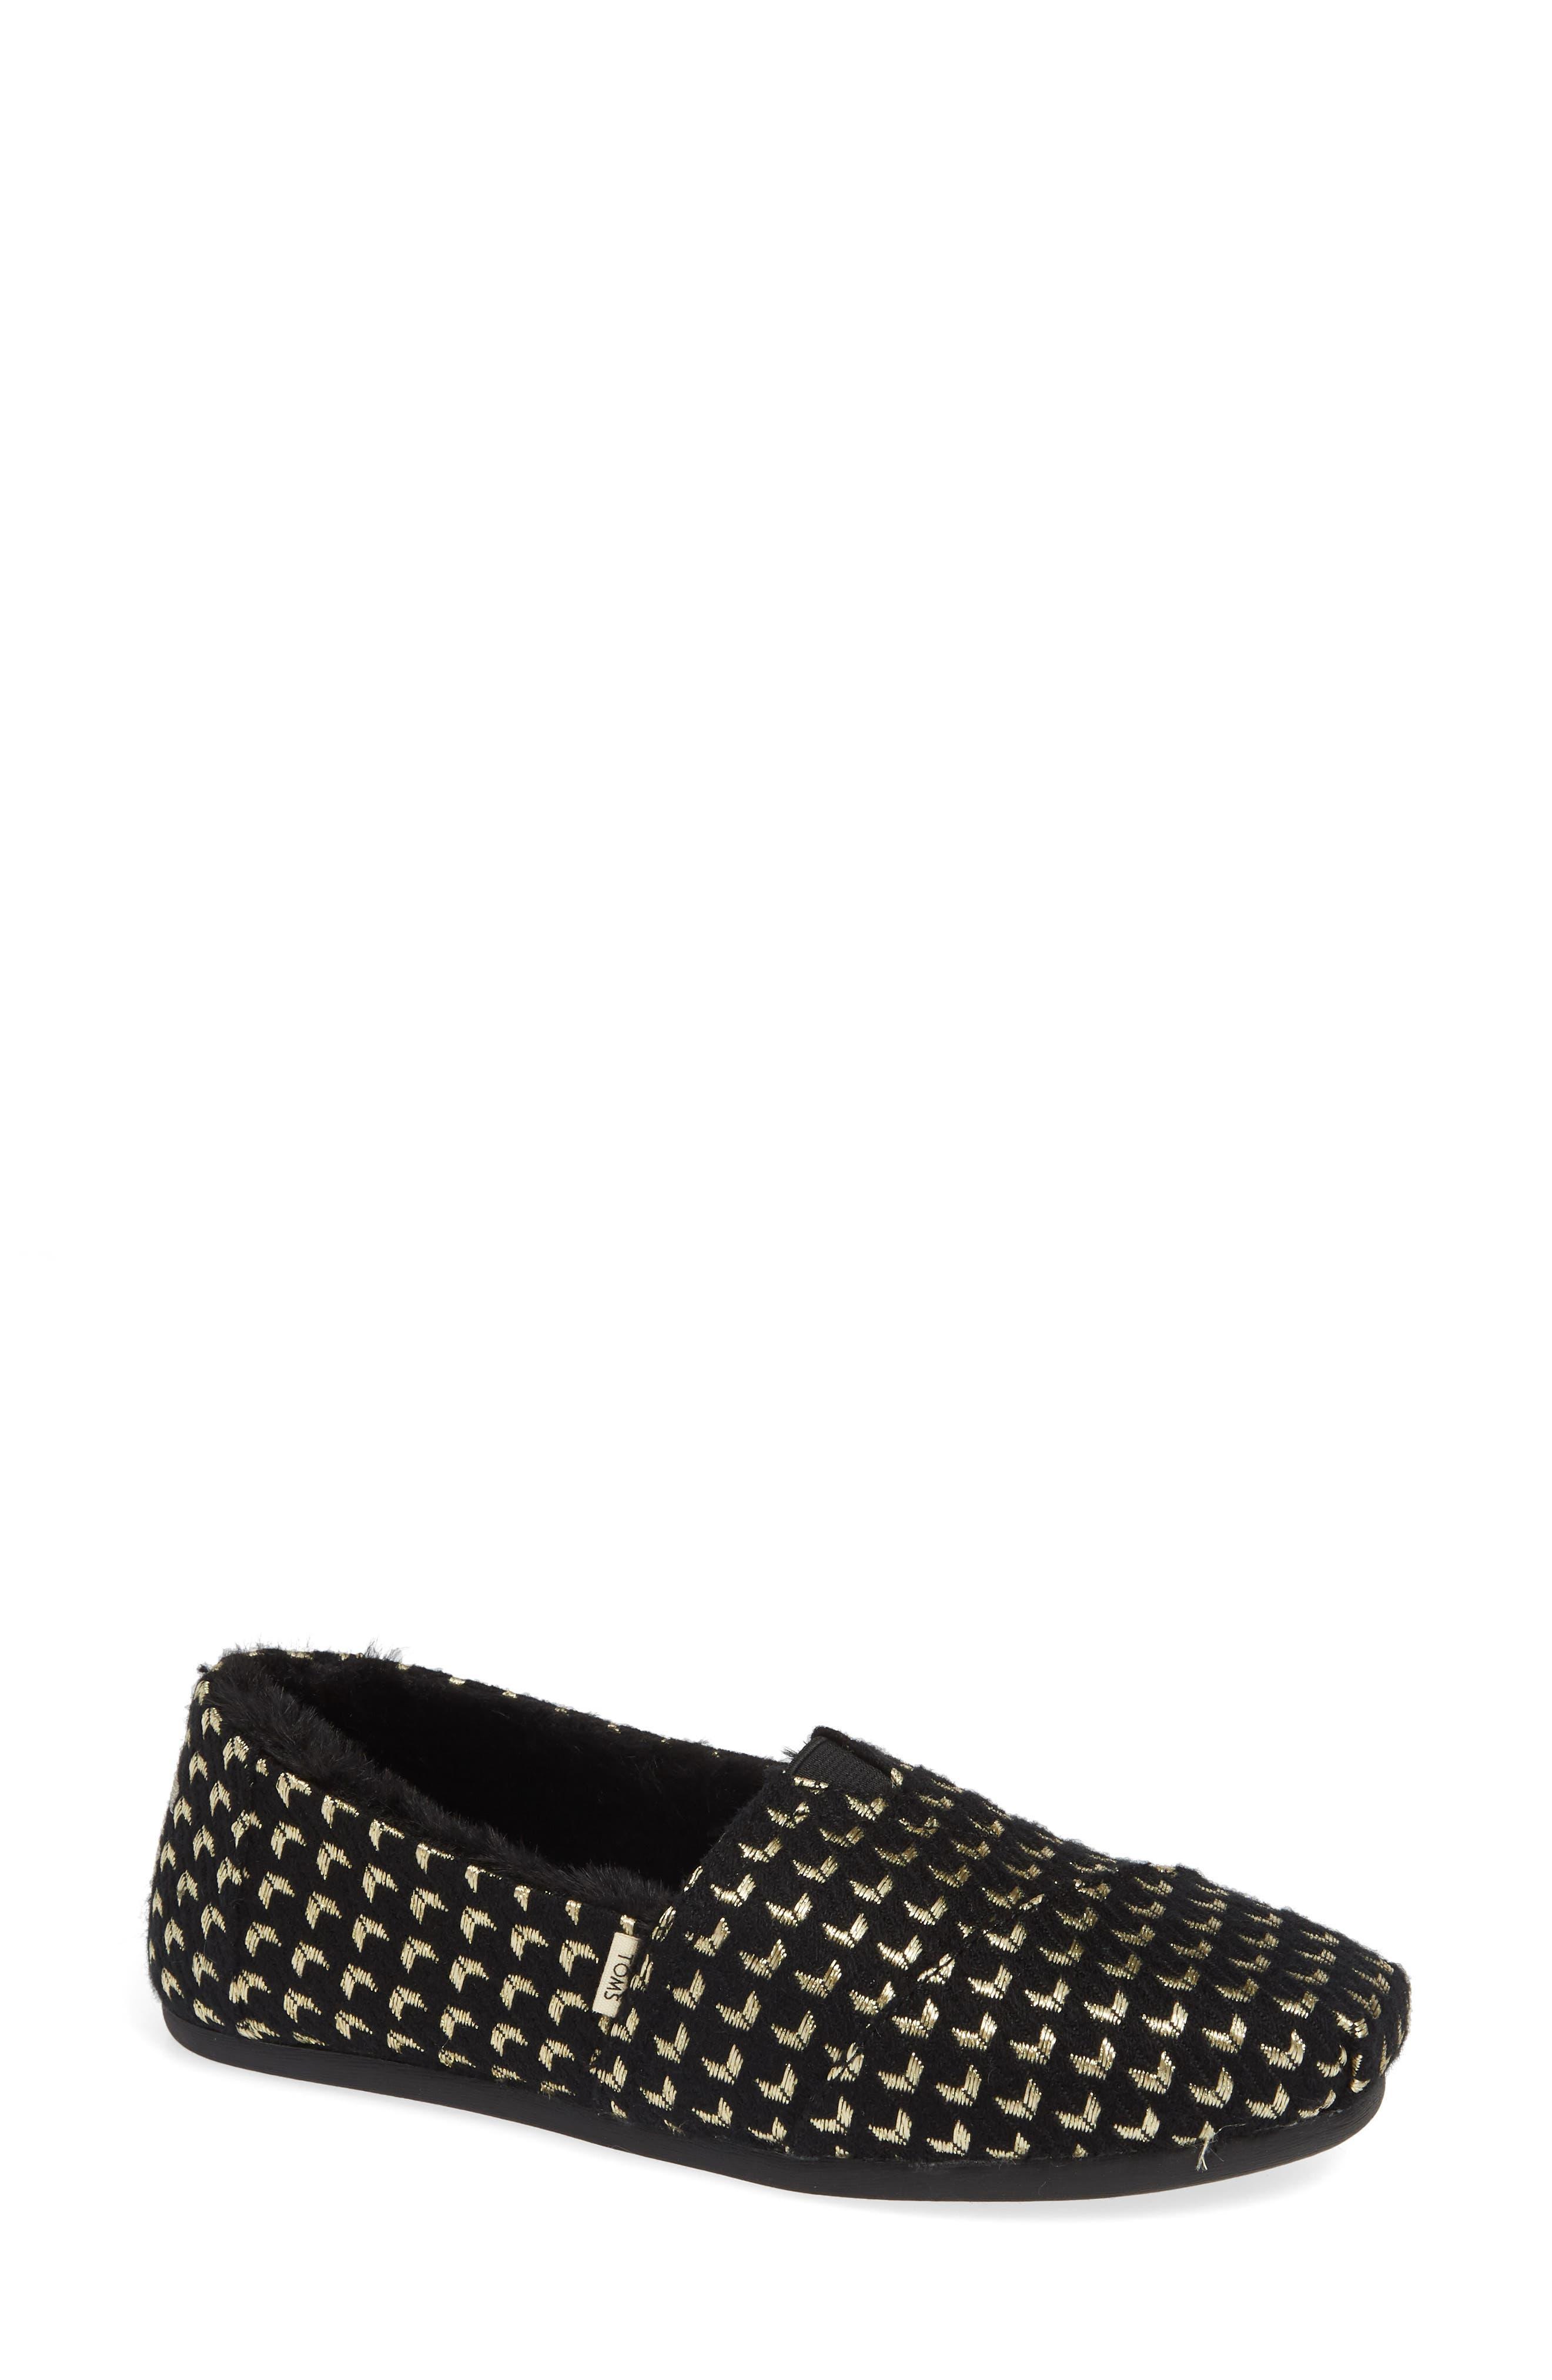 Alpargata Slip-On, Main, color, BLACK GEO PRINT FABRIC